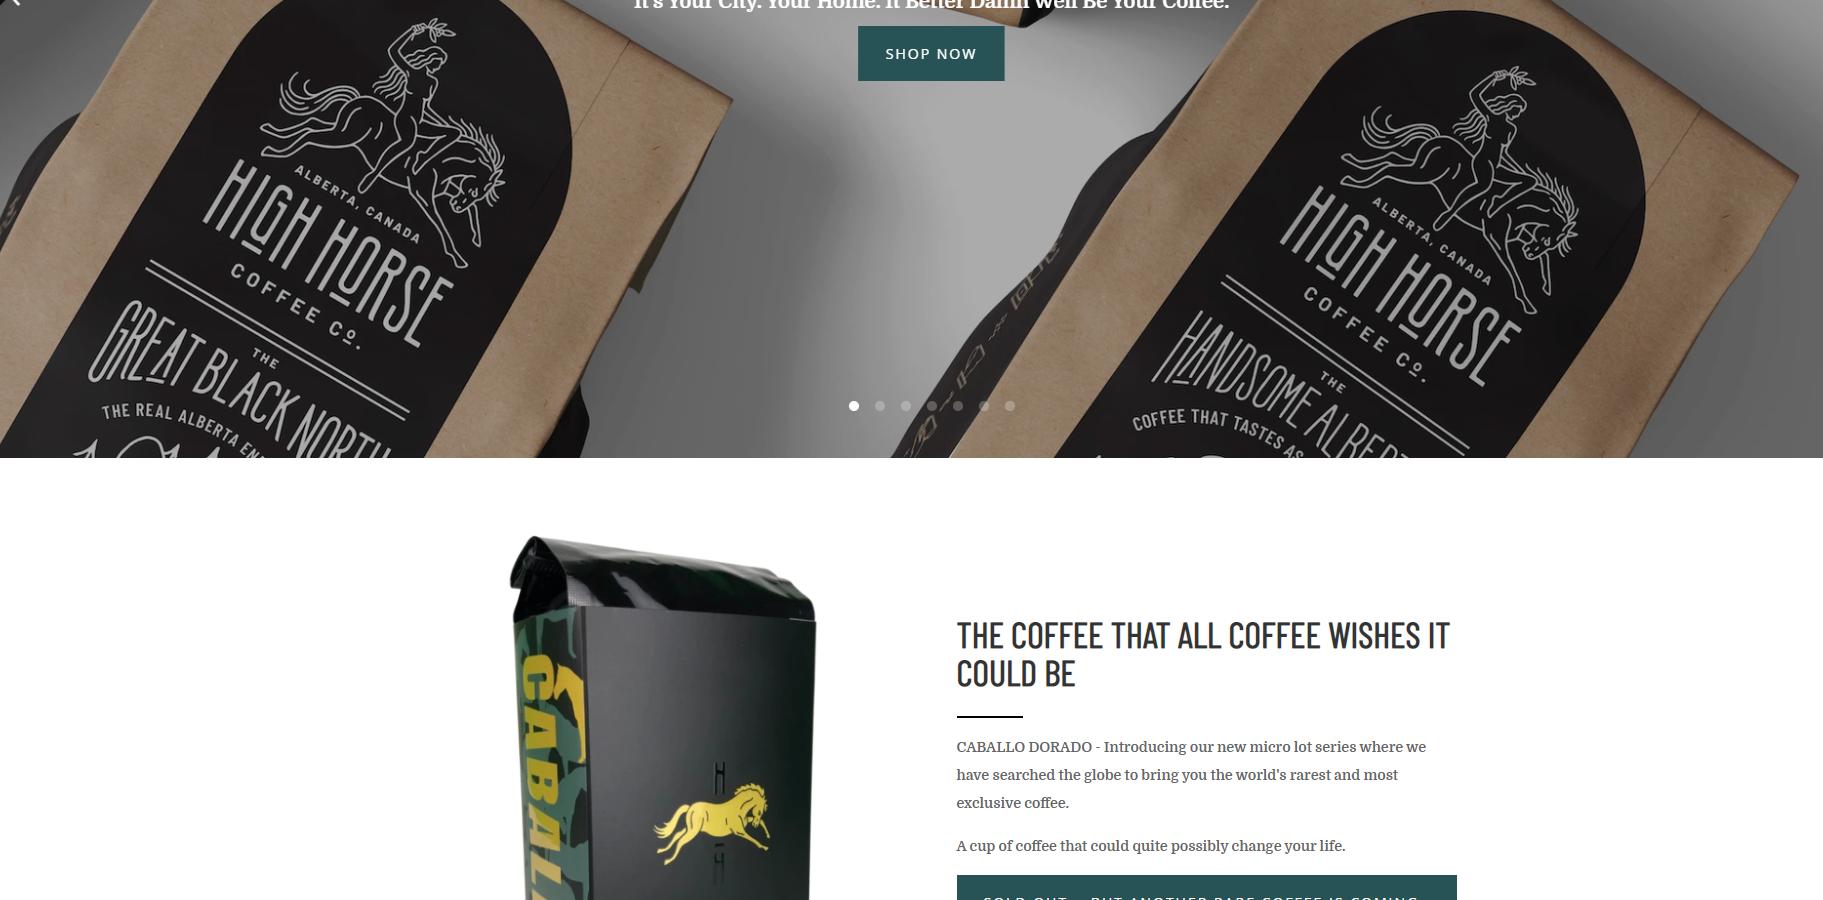 highhorse-coffee-website